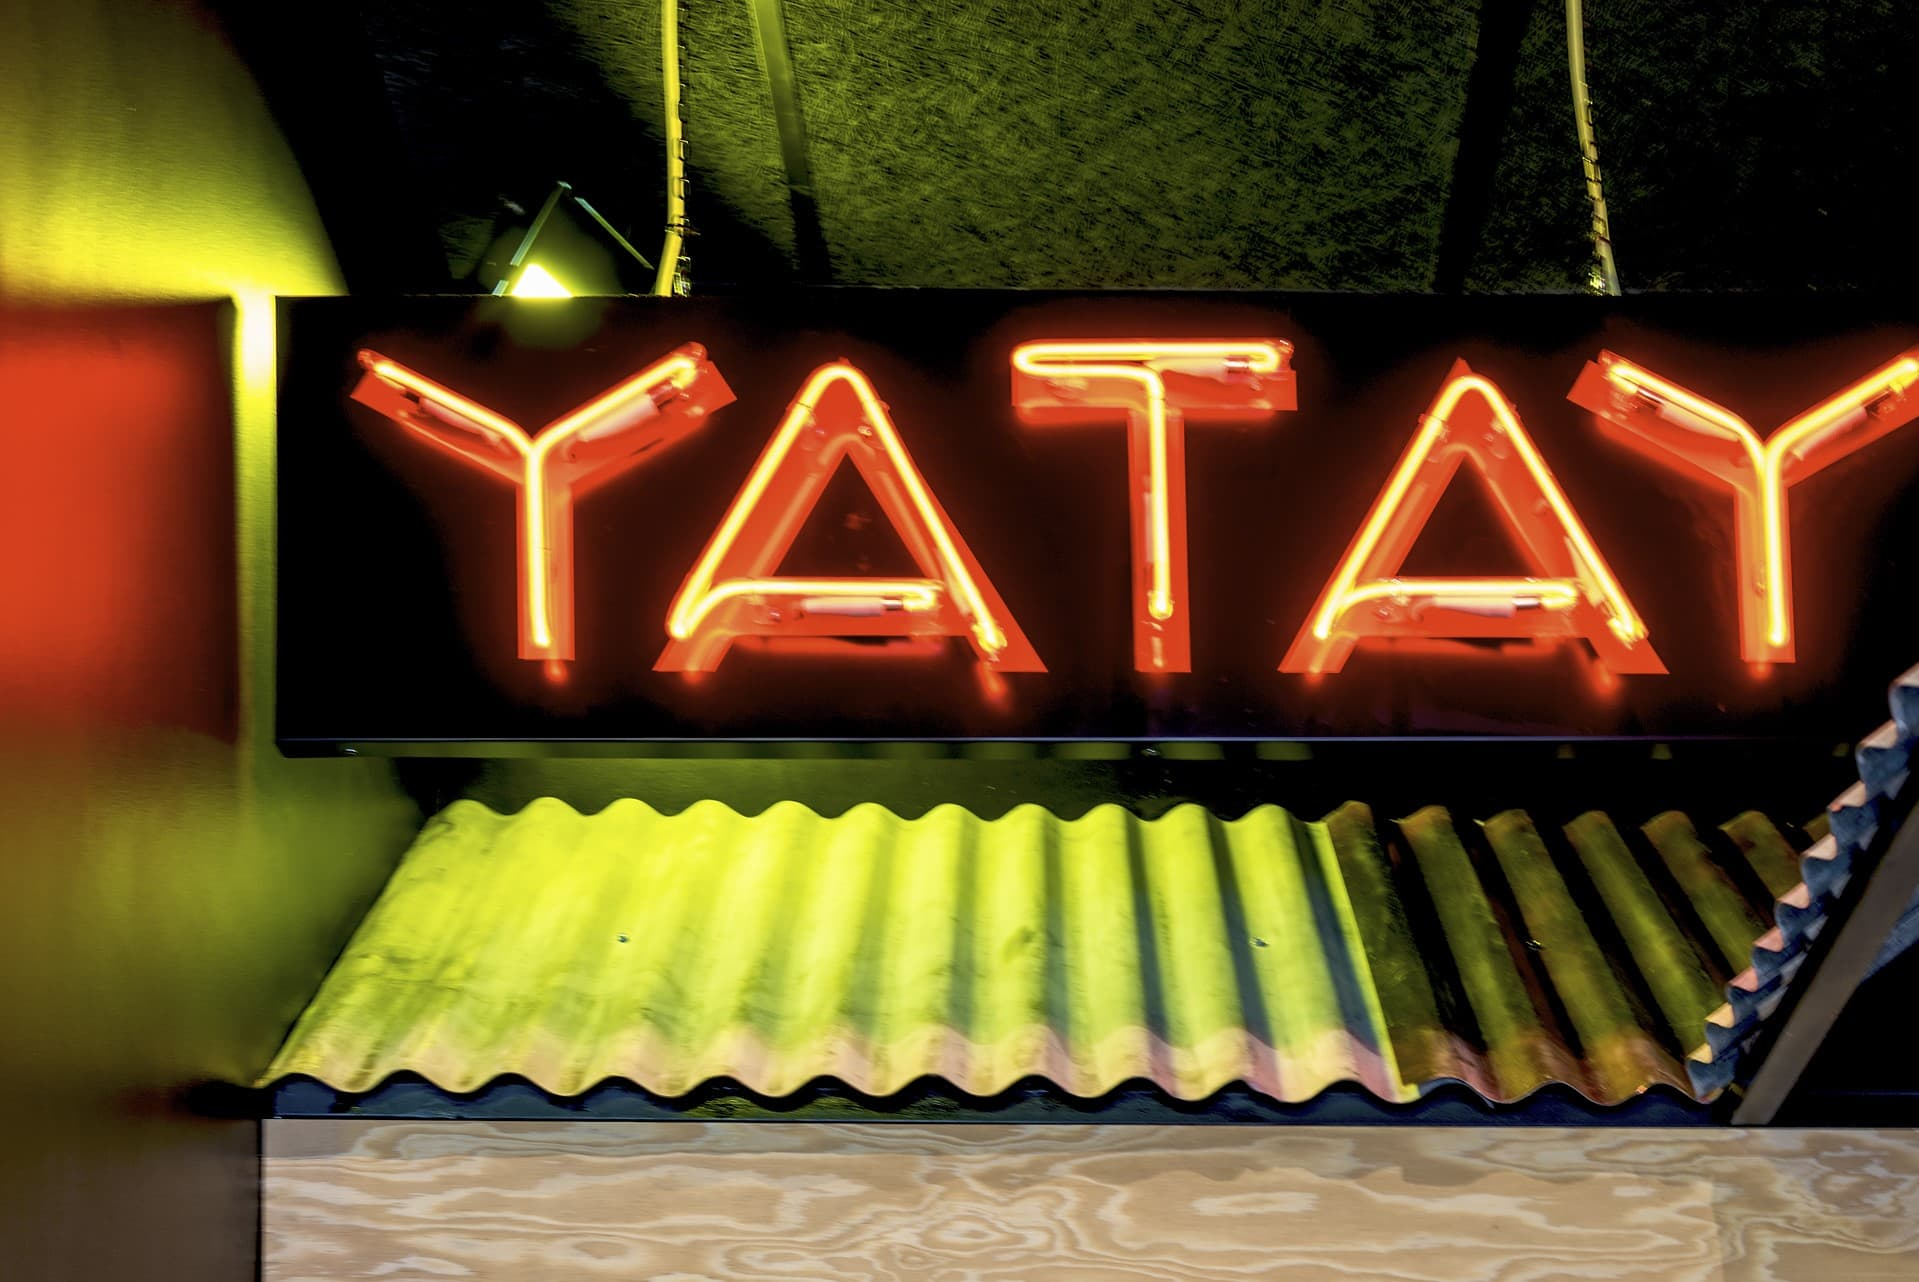 Devanture du Yatay